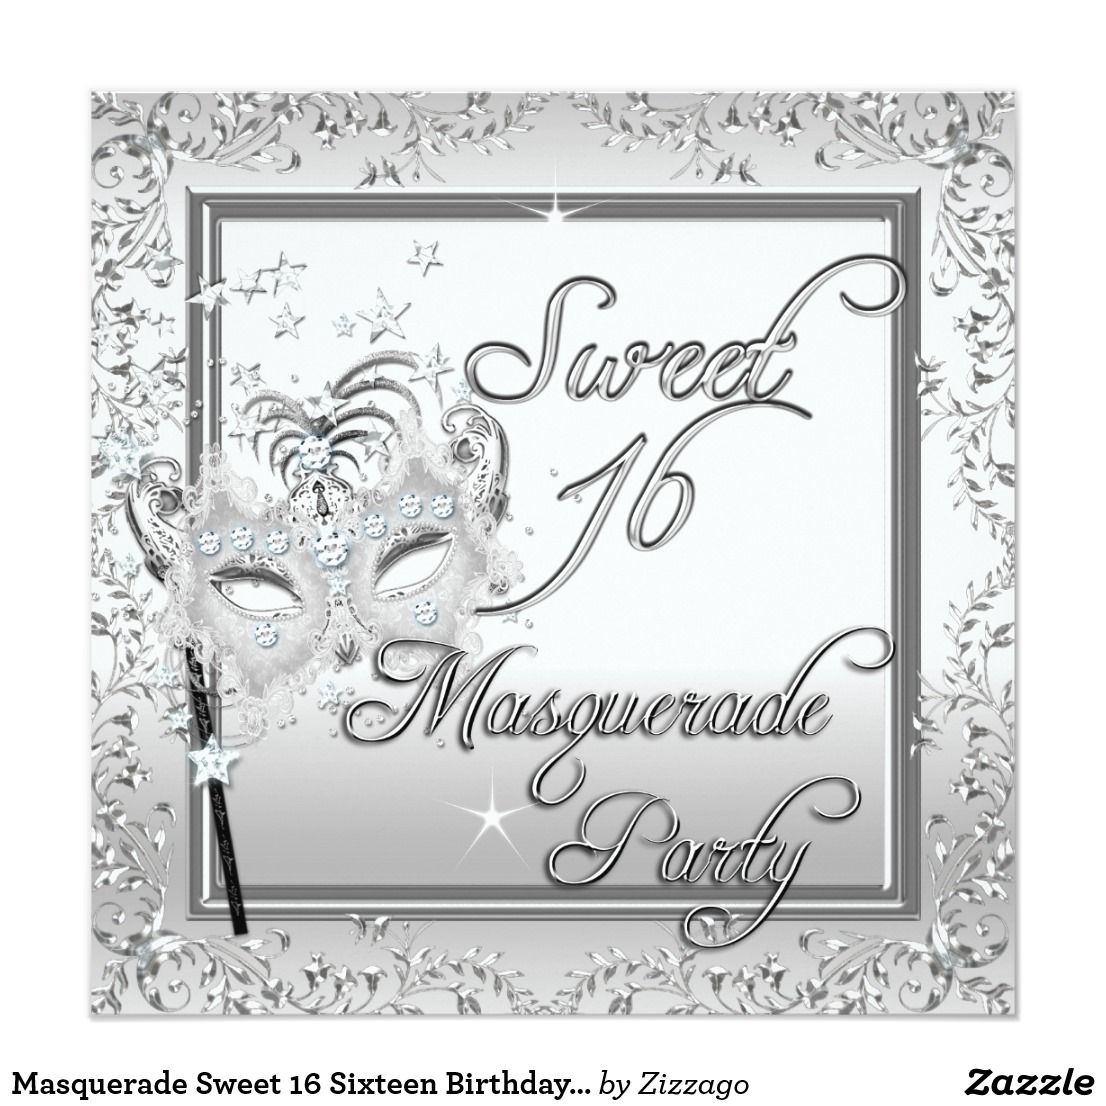 Masquerade Sweet 16 Sixteen Birthday White Card Masquerade Mask ...